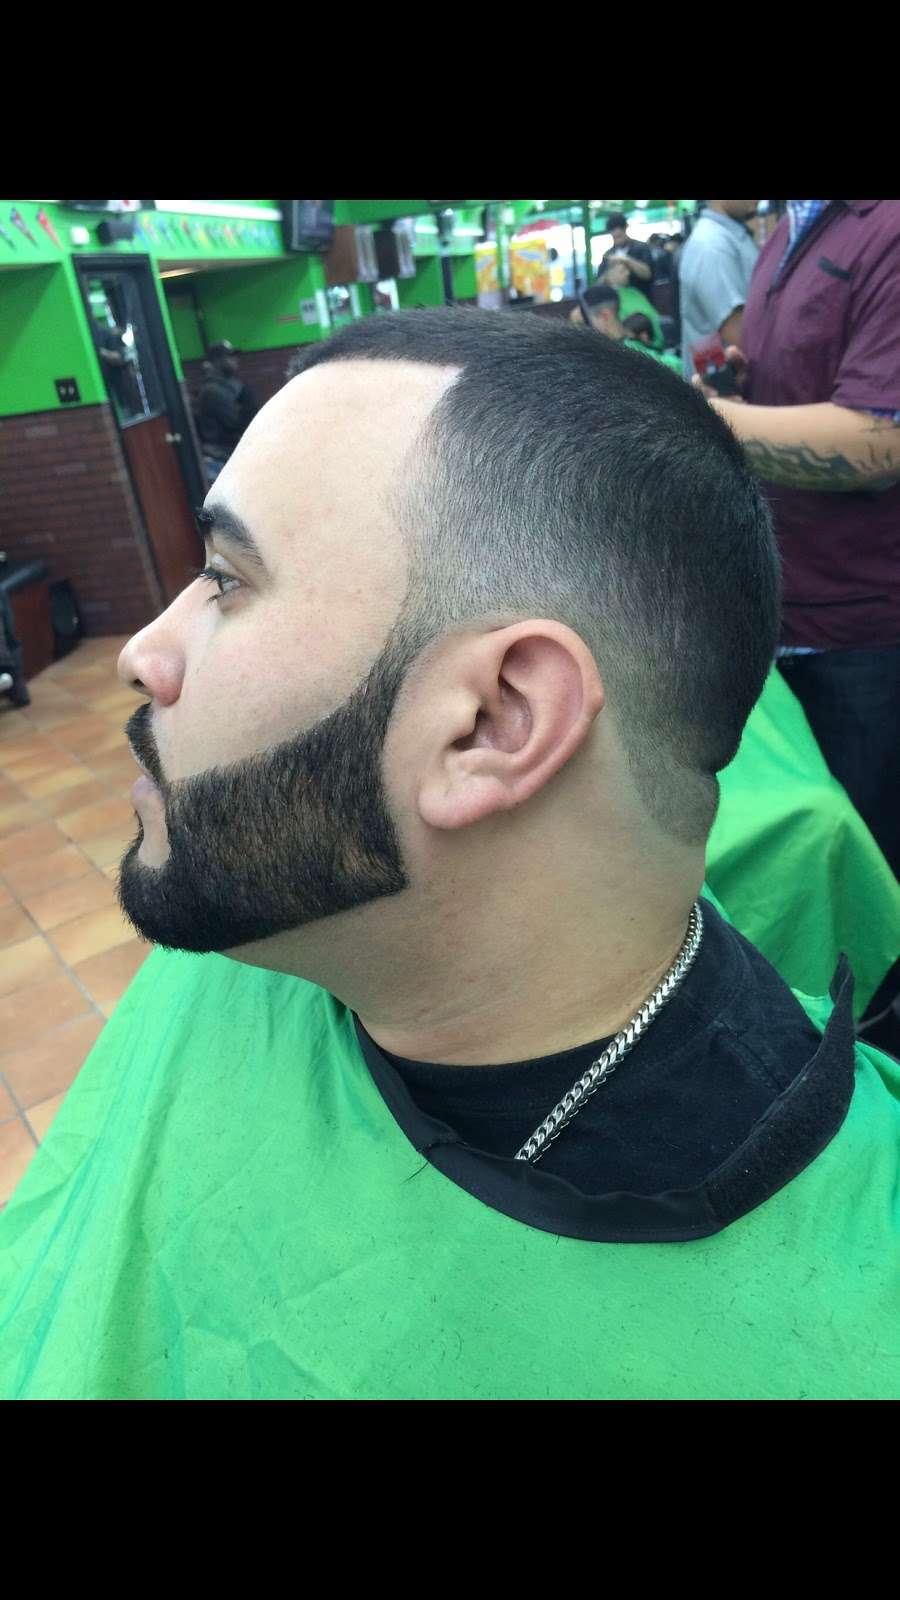 Majestic barbershop - hair care  | Photo 10 of 10 | Address: 163 Passaic St, Garfield, NJ 07026, USA | Phone: (973) 470-9777